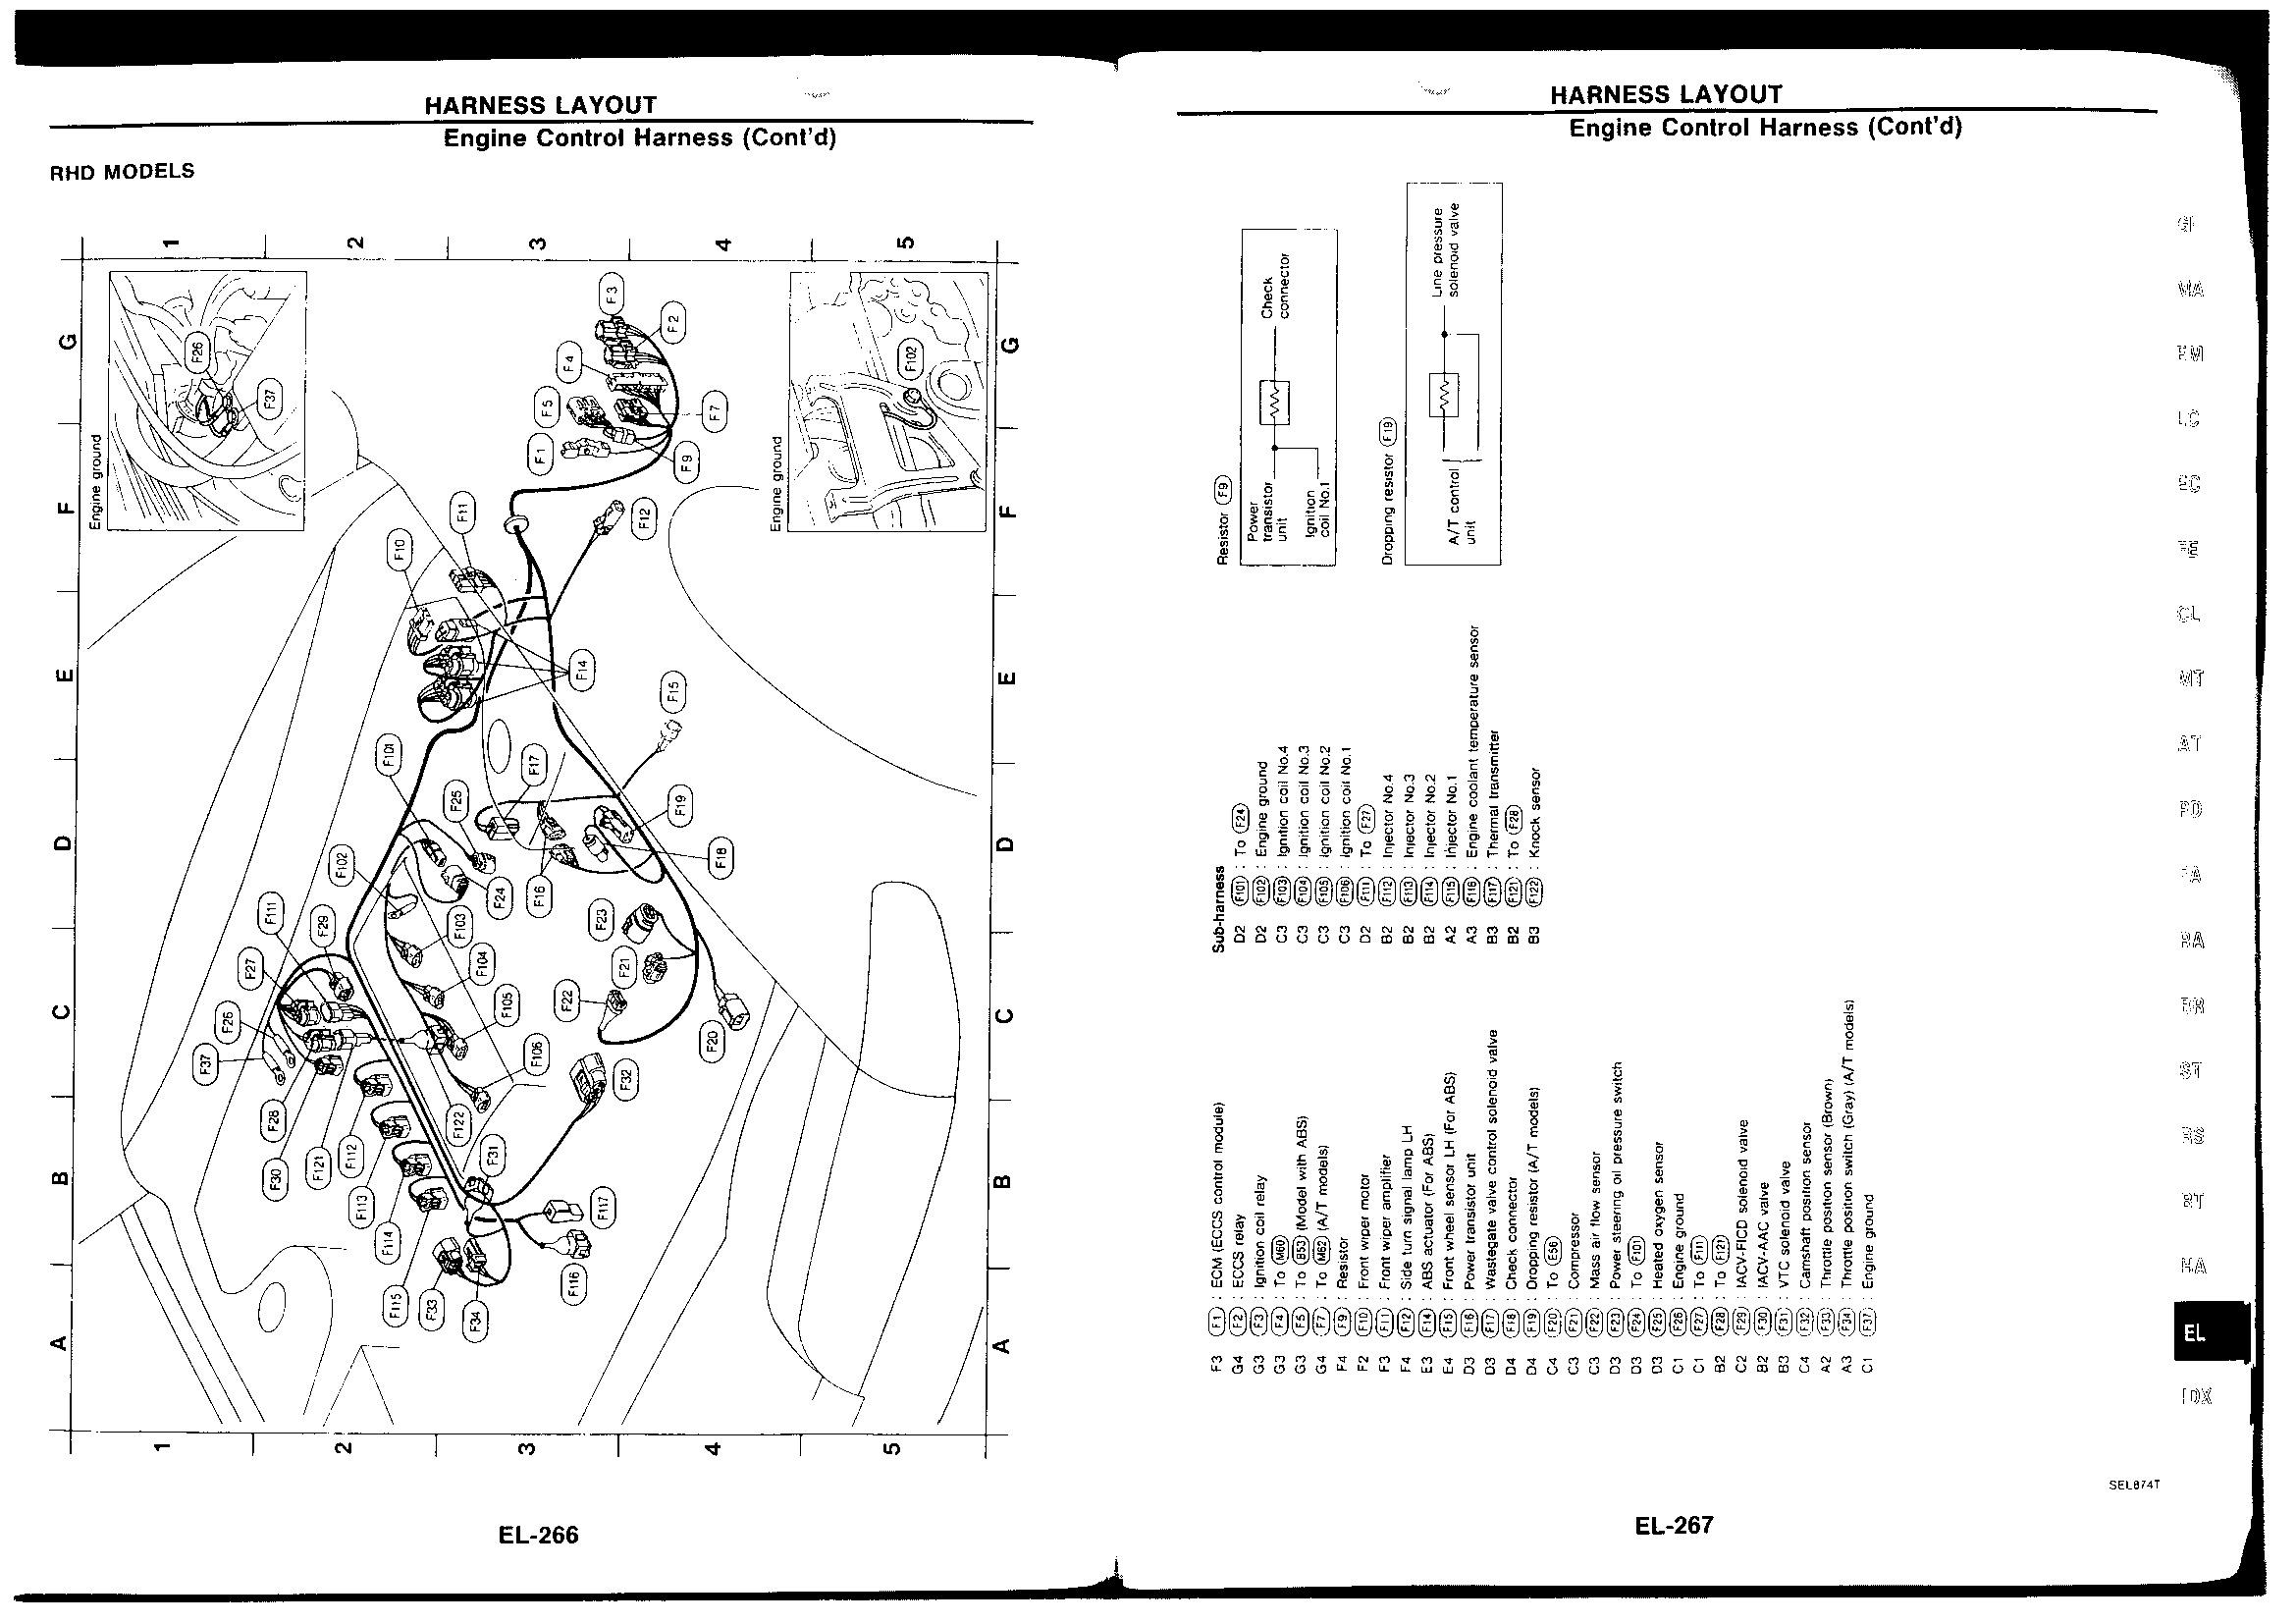 medium resolution of camstat wiring diagram for oil gandul 45 77 79 119 s14 zenki sr20det english text page 802 w